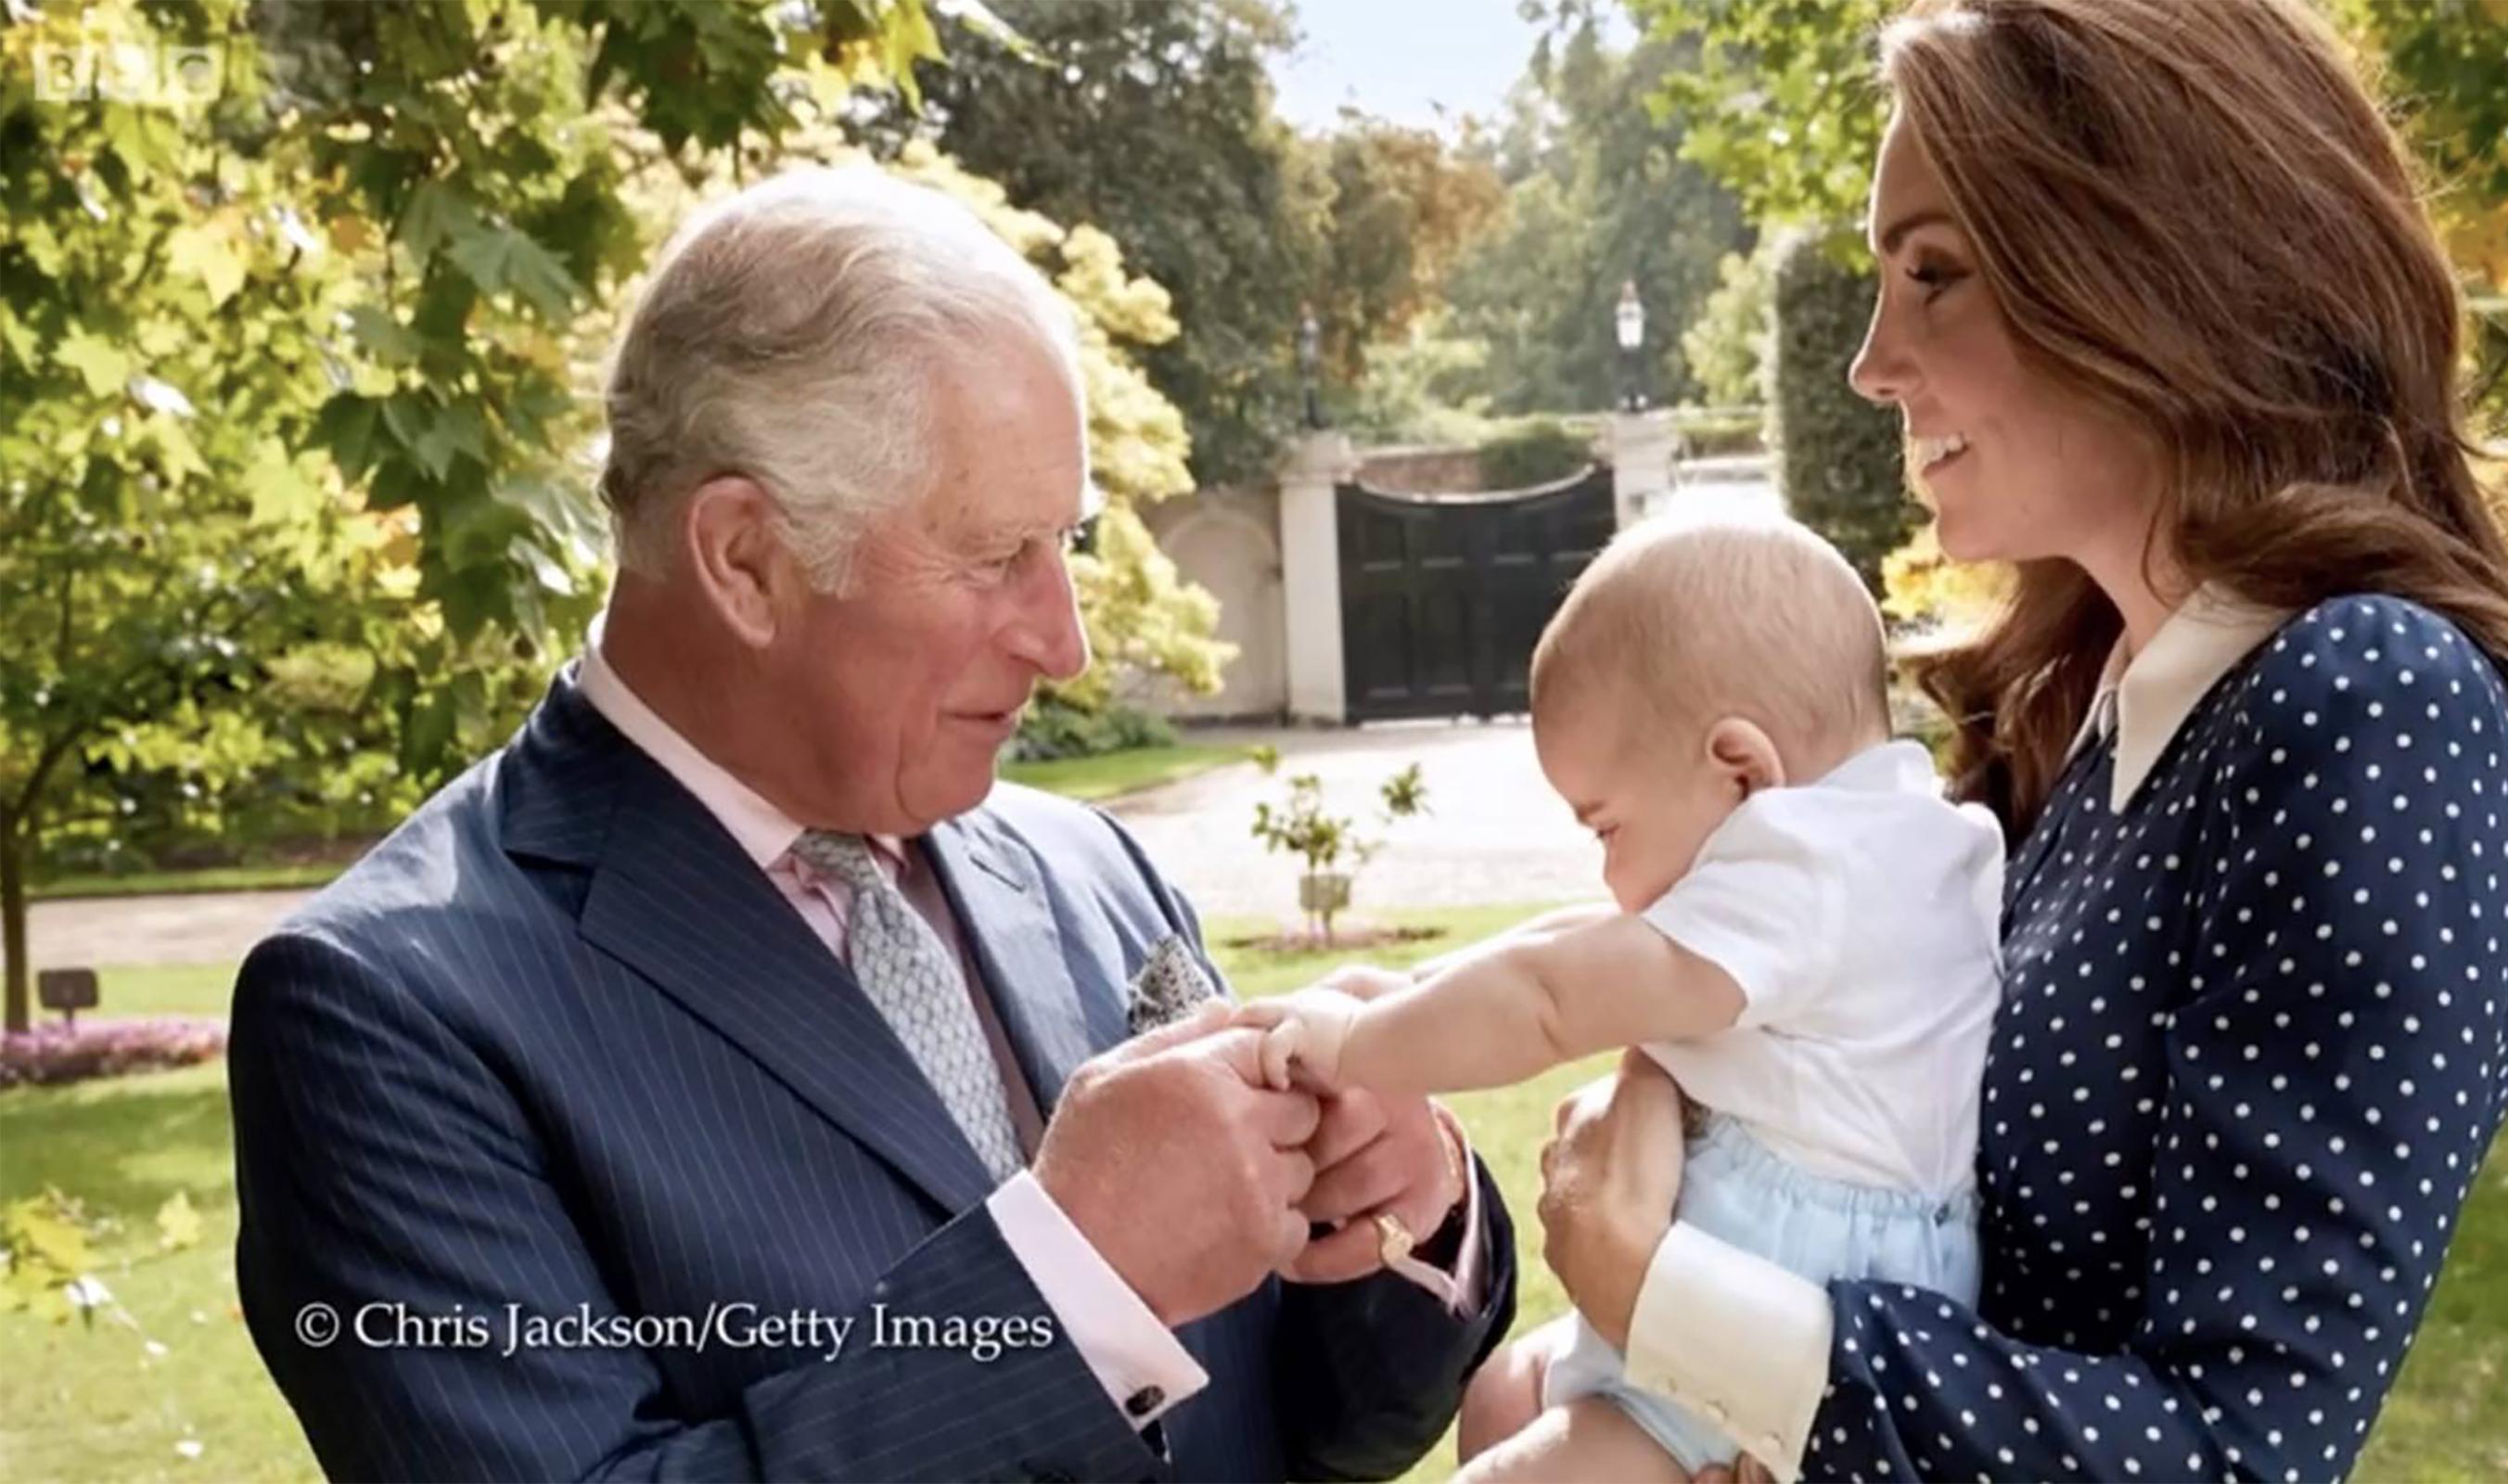 Prince Charles, Prince Louis and Kate Middleton